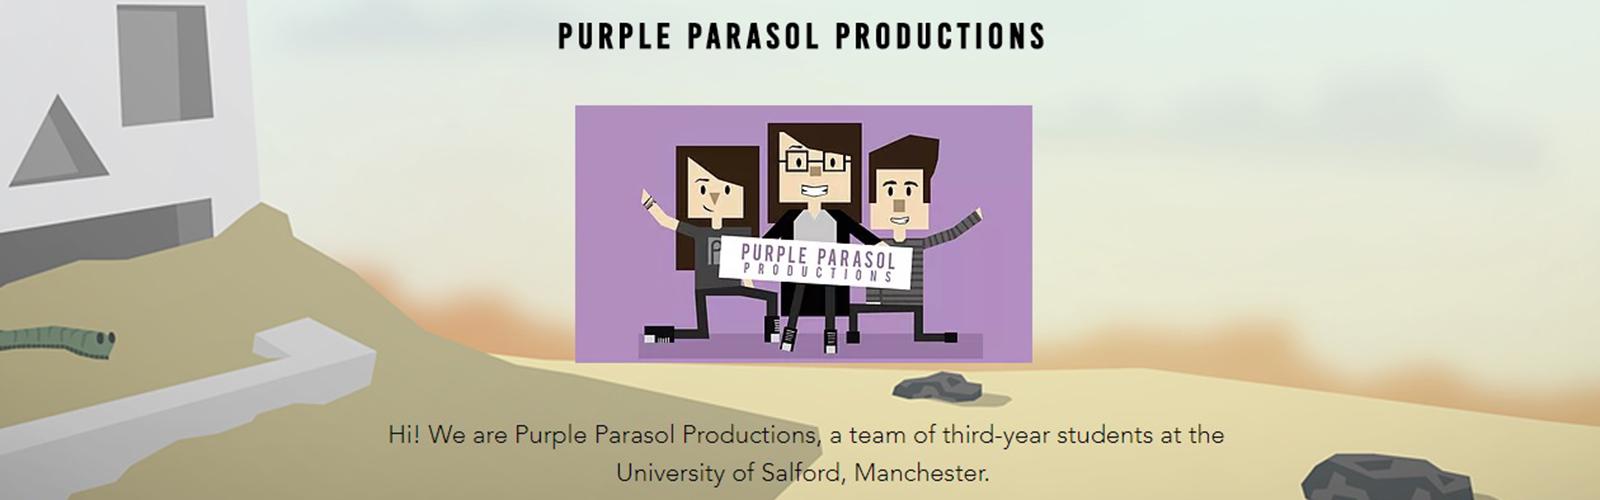 Image: Purple Parasol Productions Header